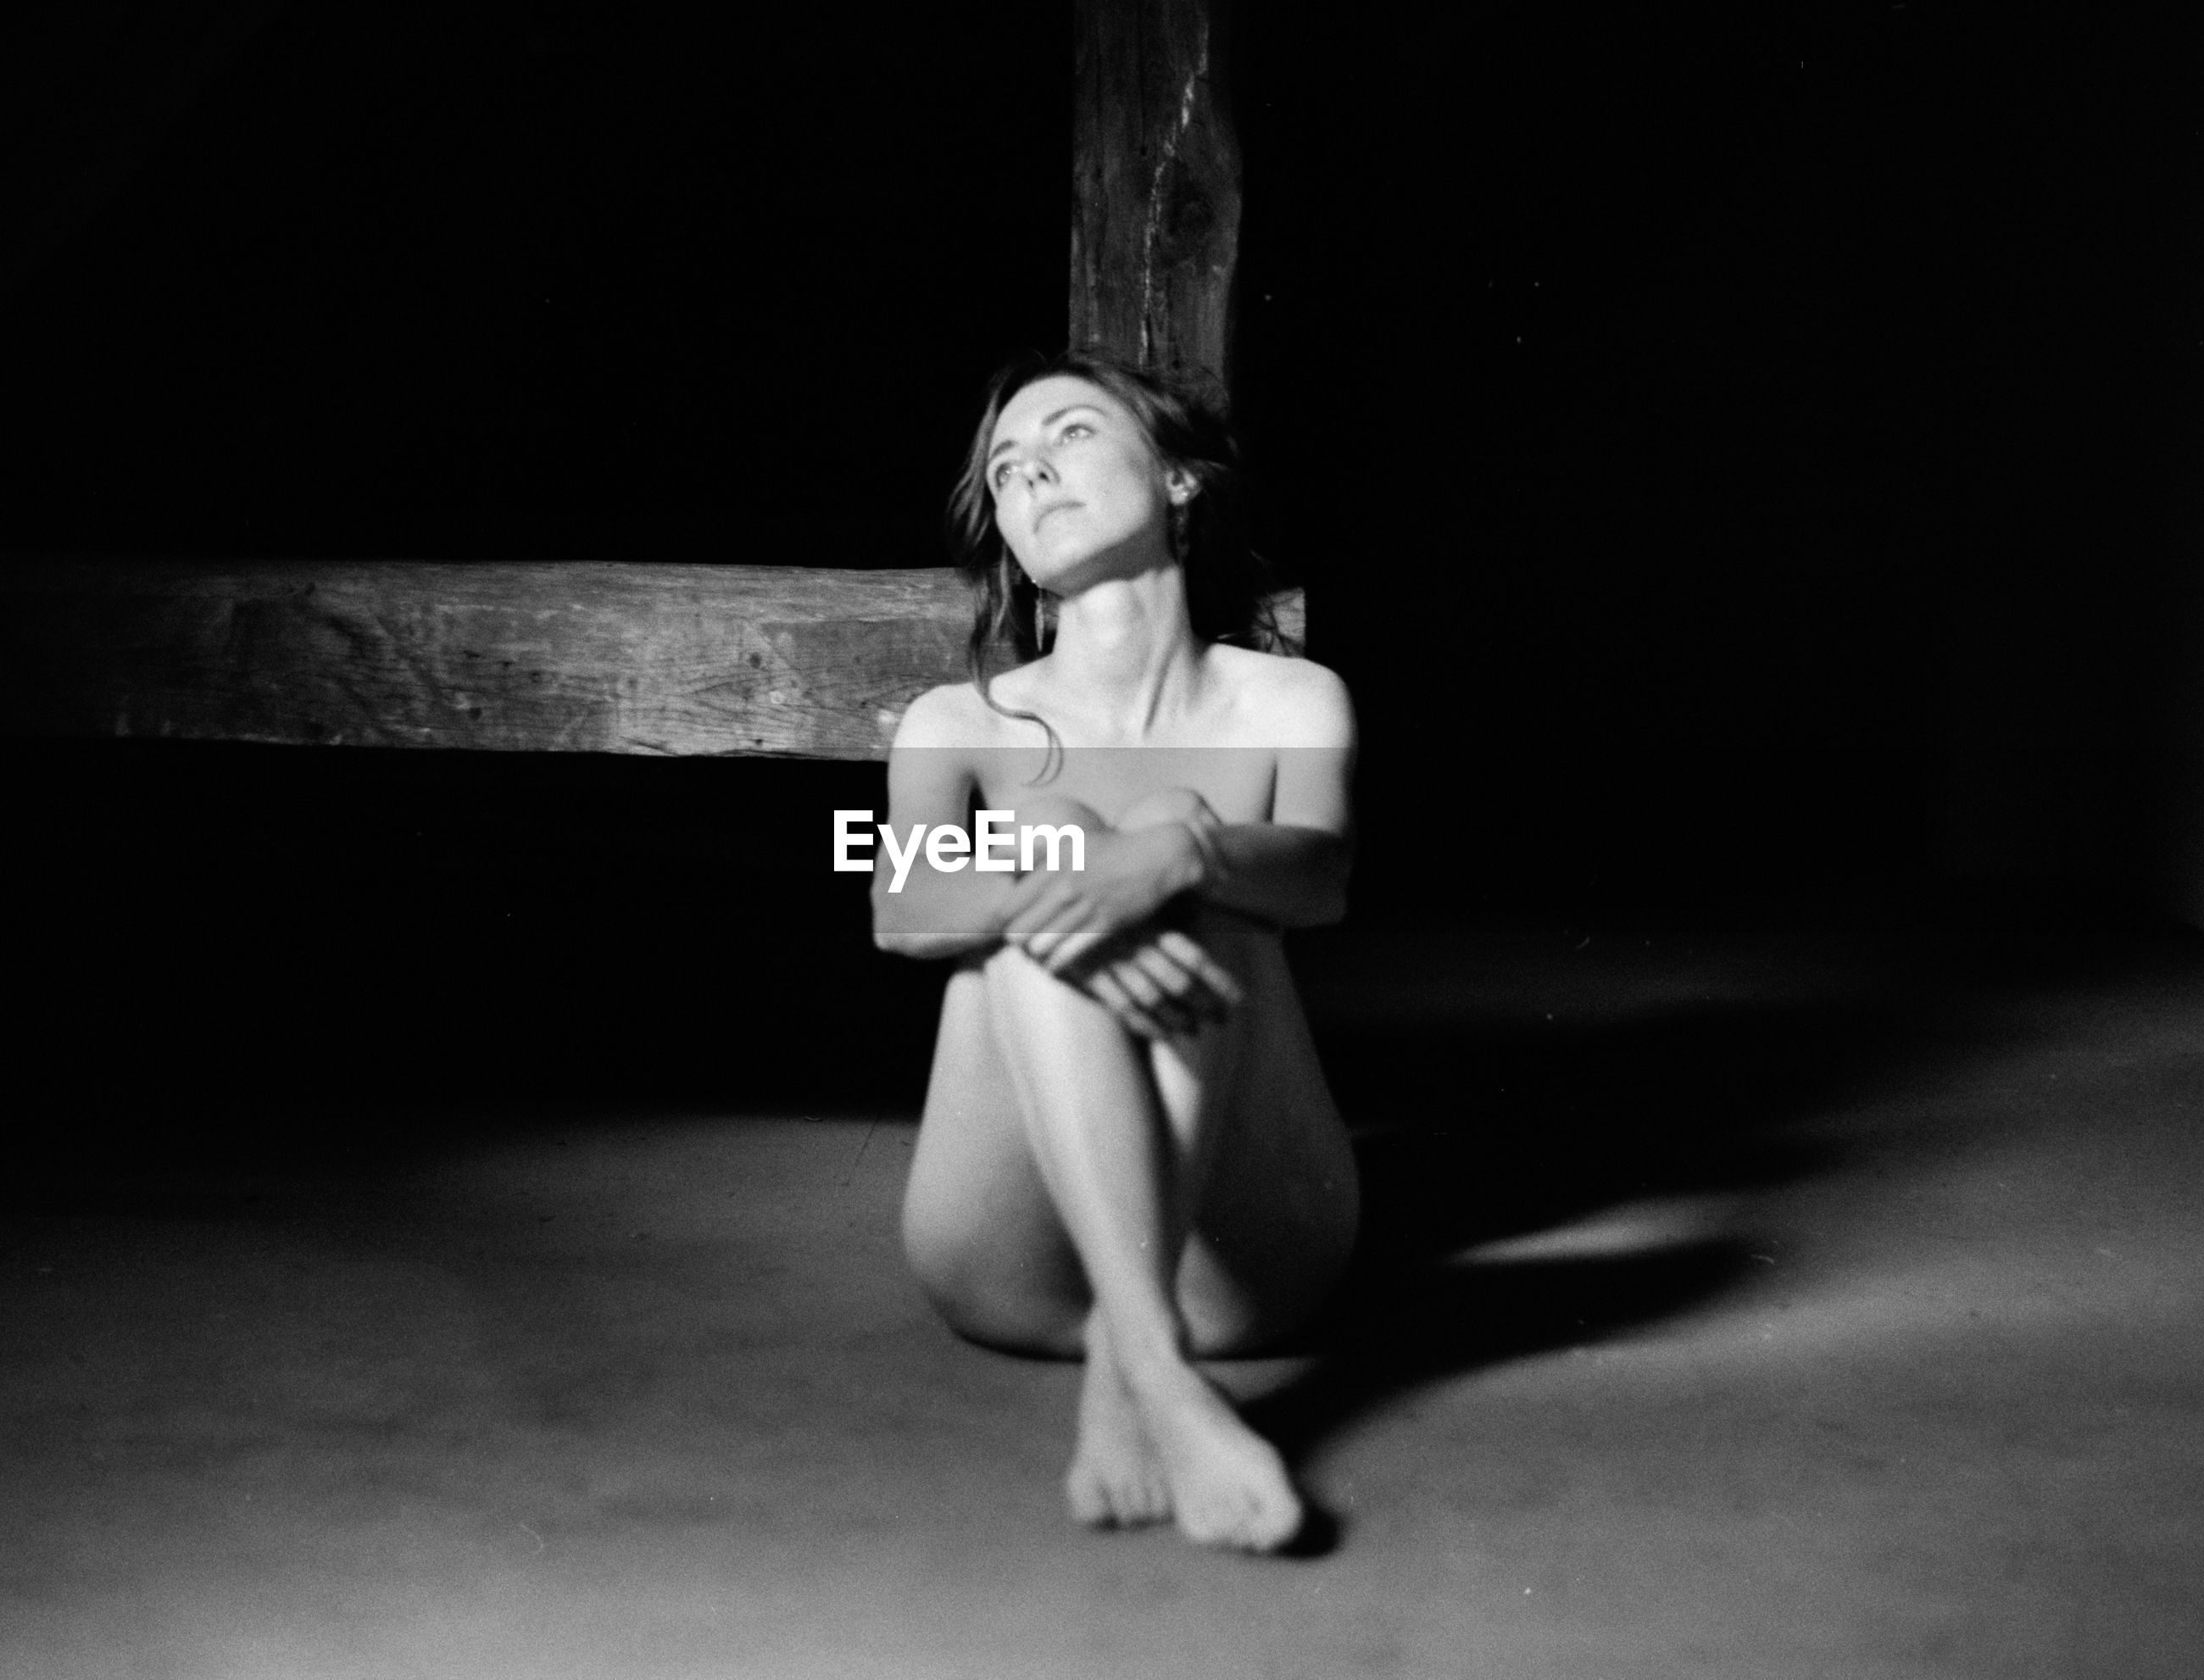 Sad naked woman sitting in darkroom